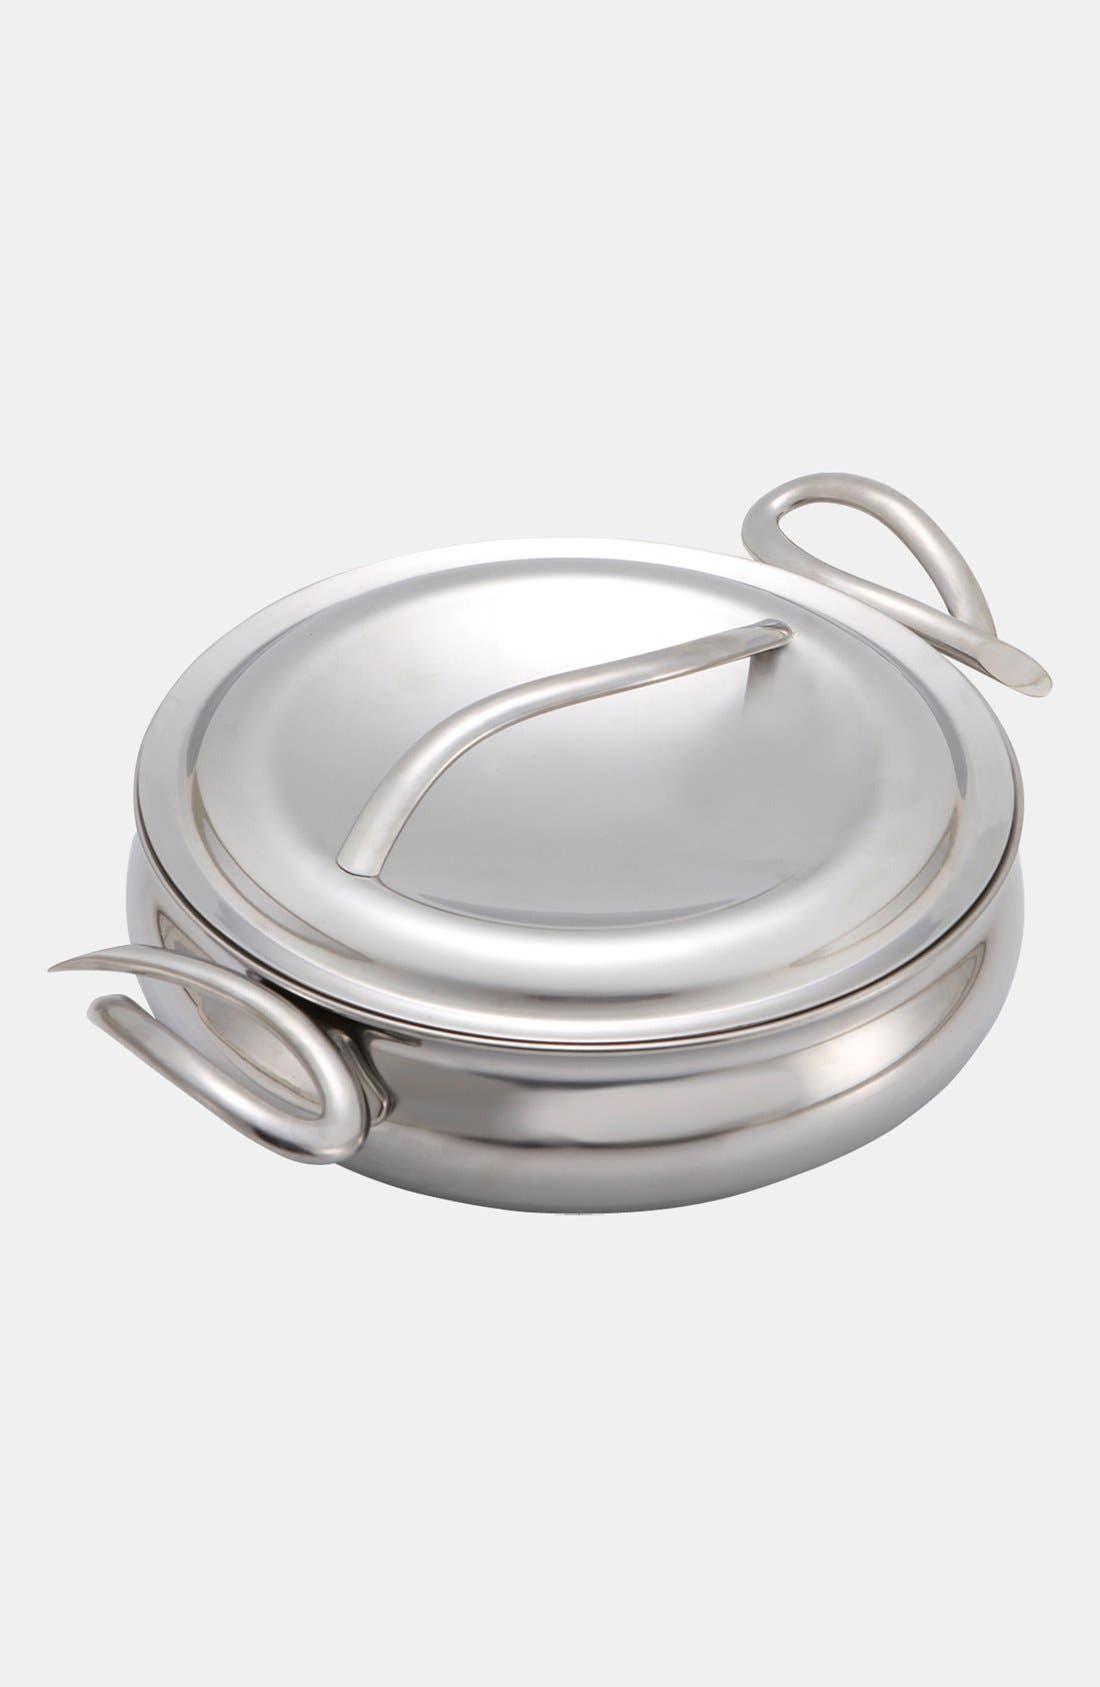 CookServ 10 Inch Sauté Pan,                         Main,                         color, Silver